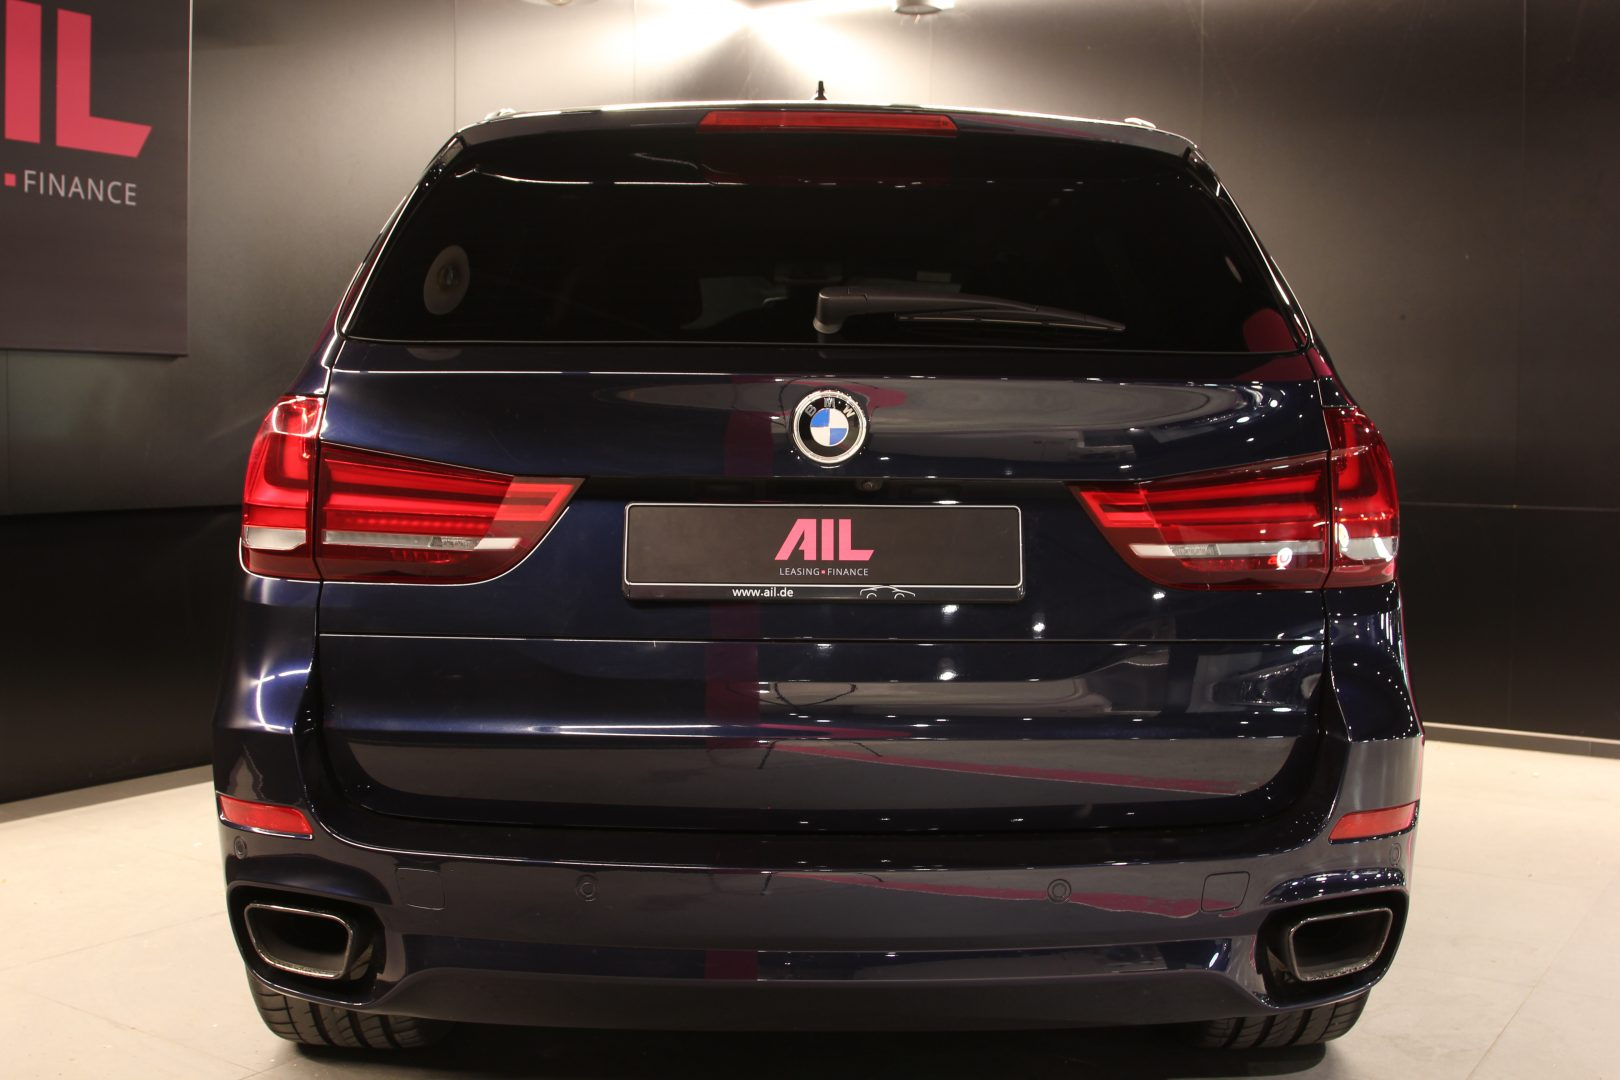 AIL BMW X5 M50d Bang & Olufsen Panorama RSE 4